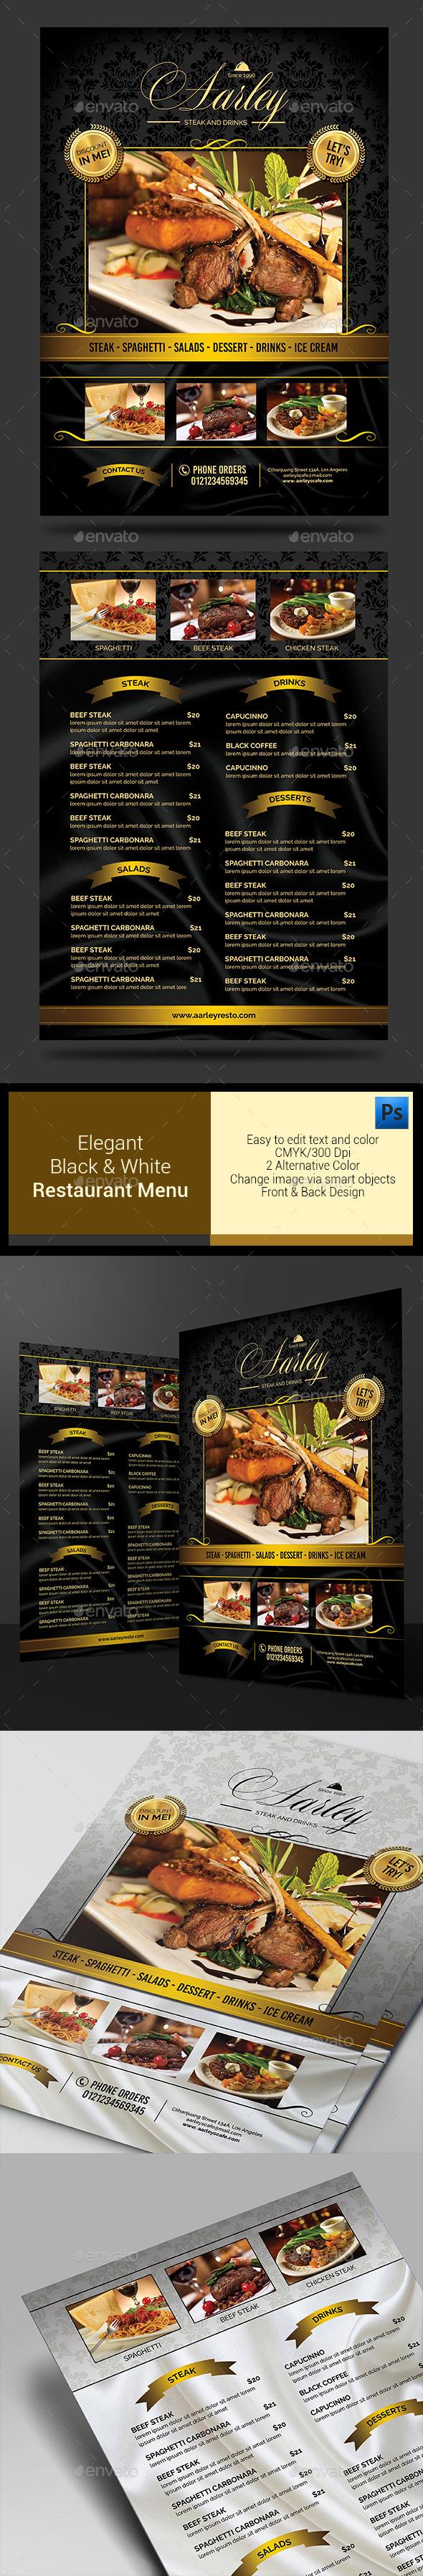 Elegant Black & White Restaurant Menu - Food Menus Print Templates